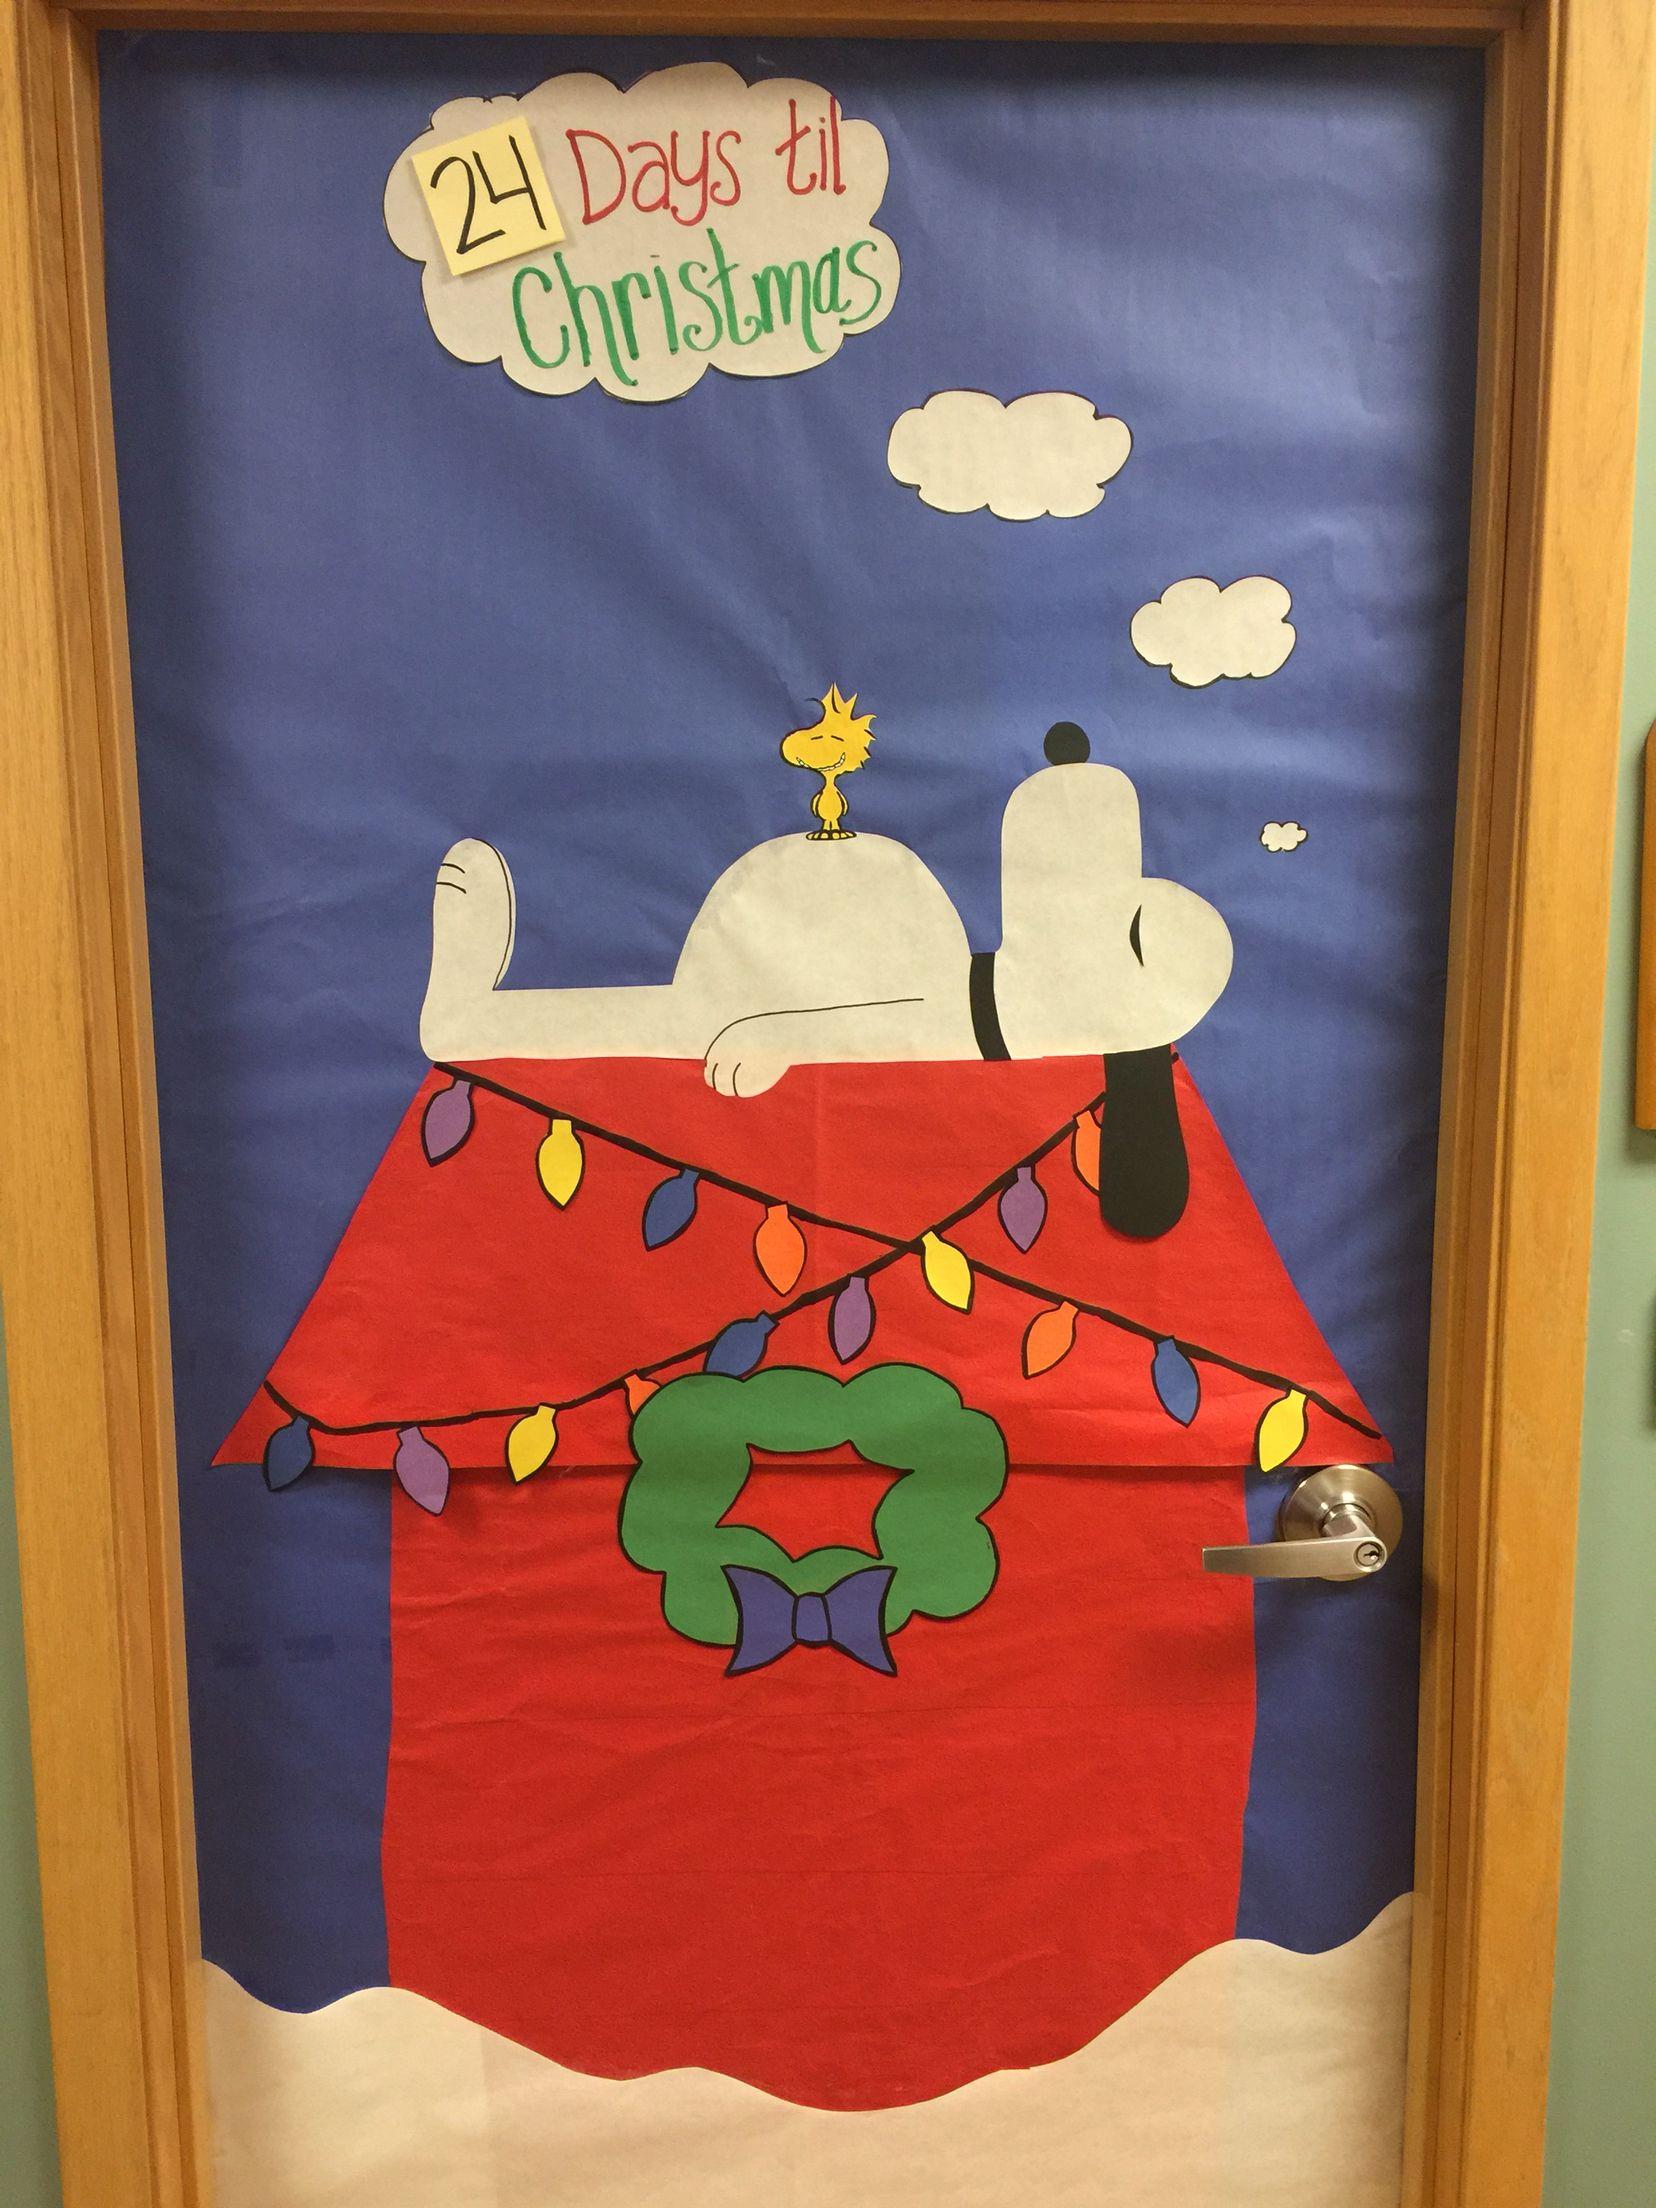 Charlie Brown Door decoration, peanut, snoopy, ideas, cute